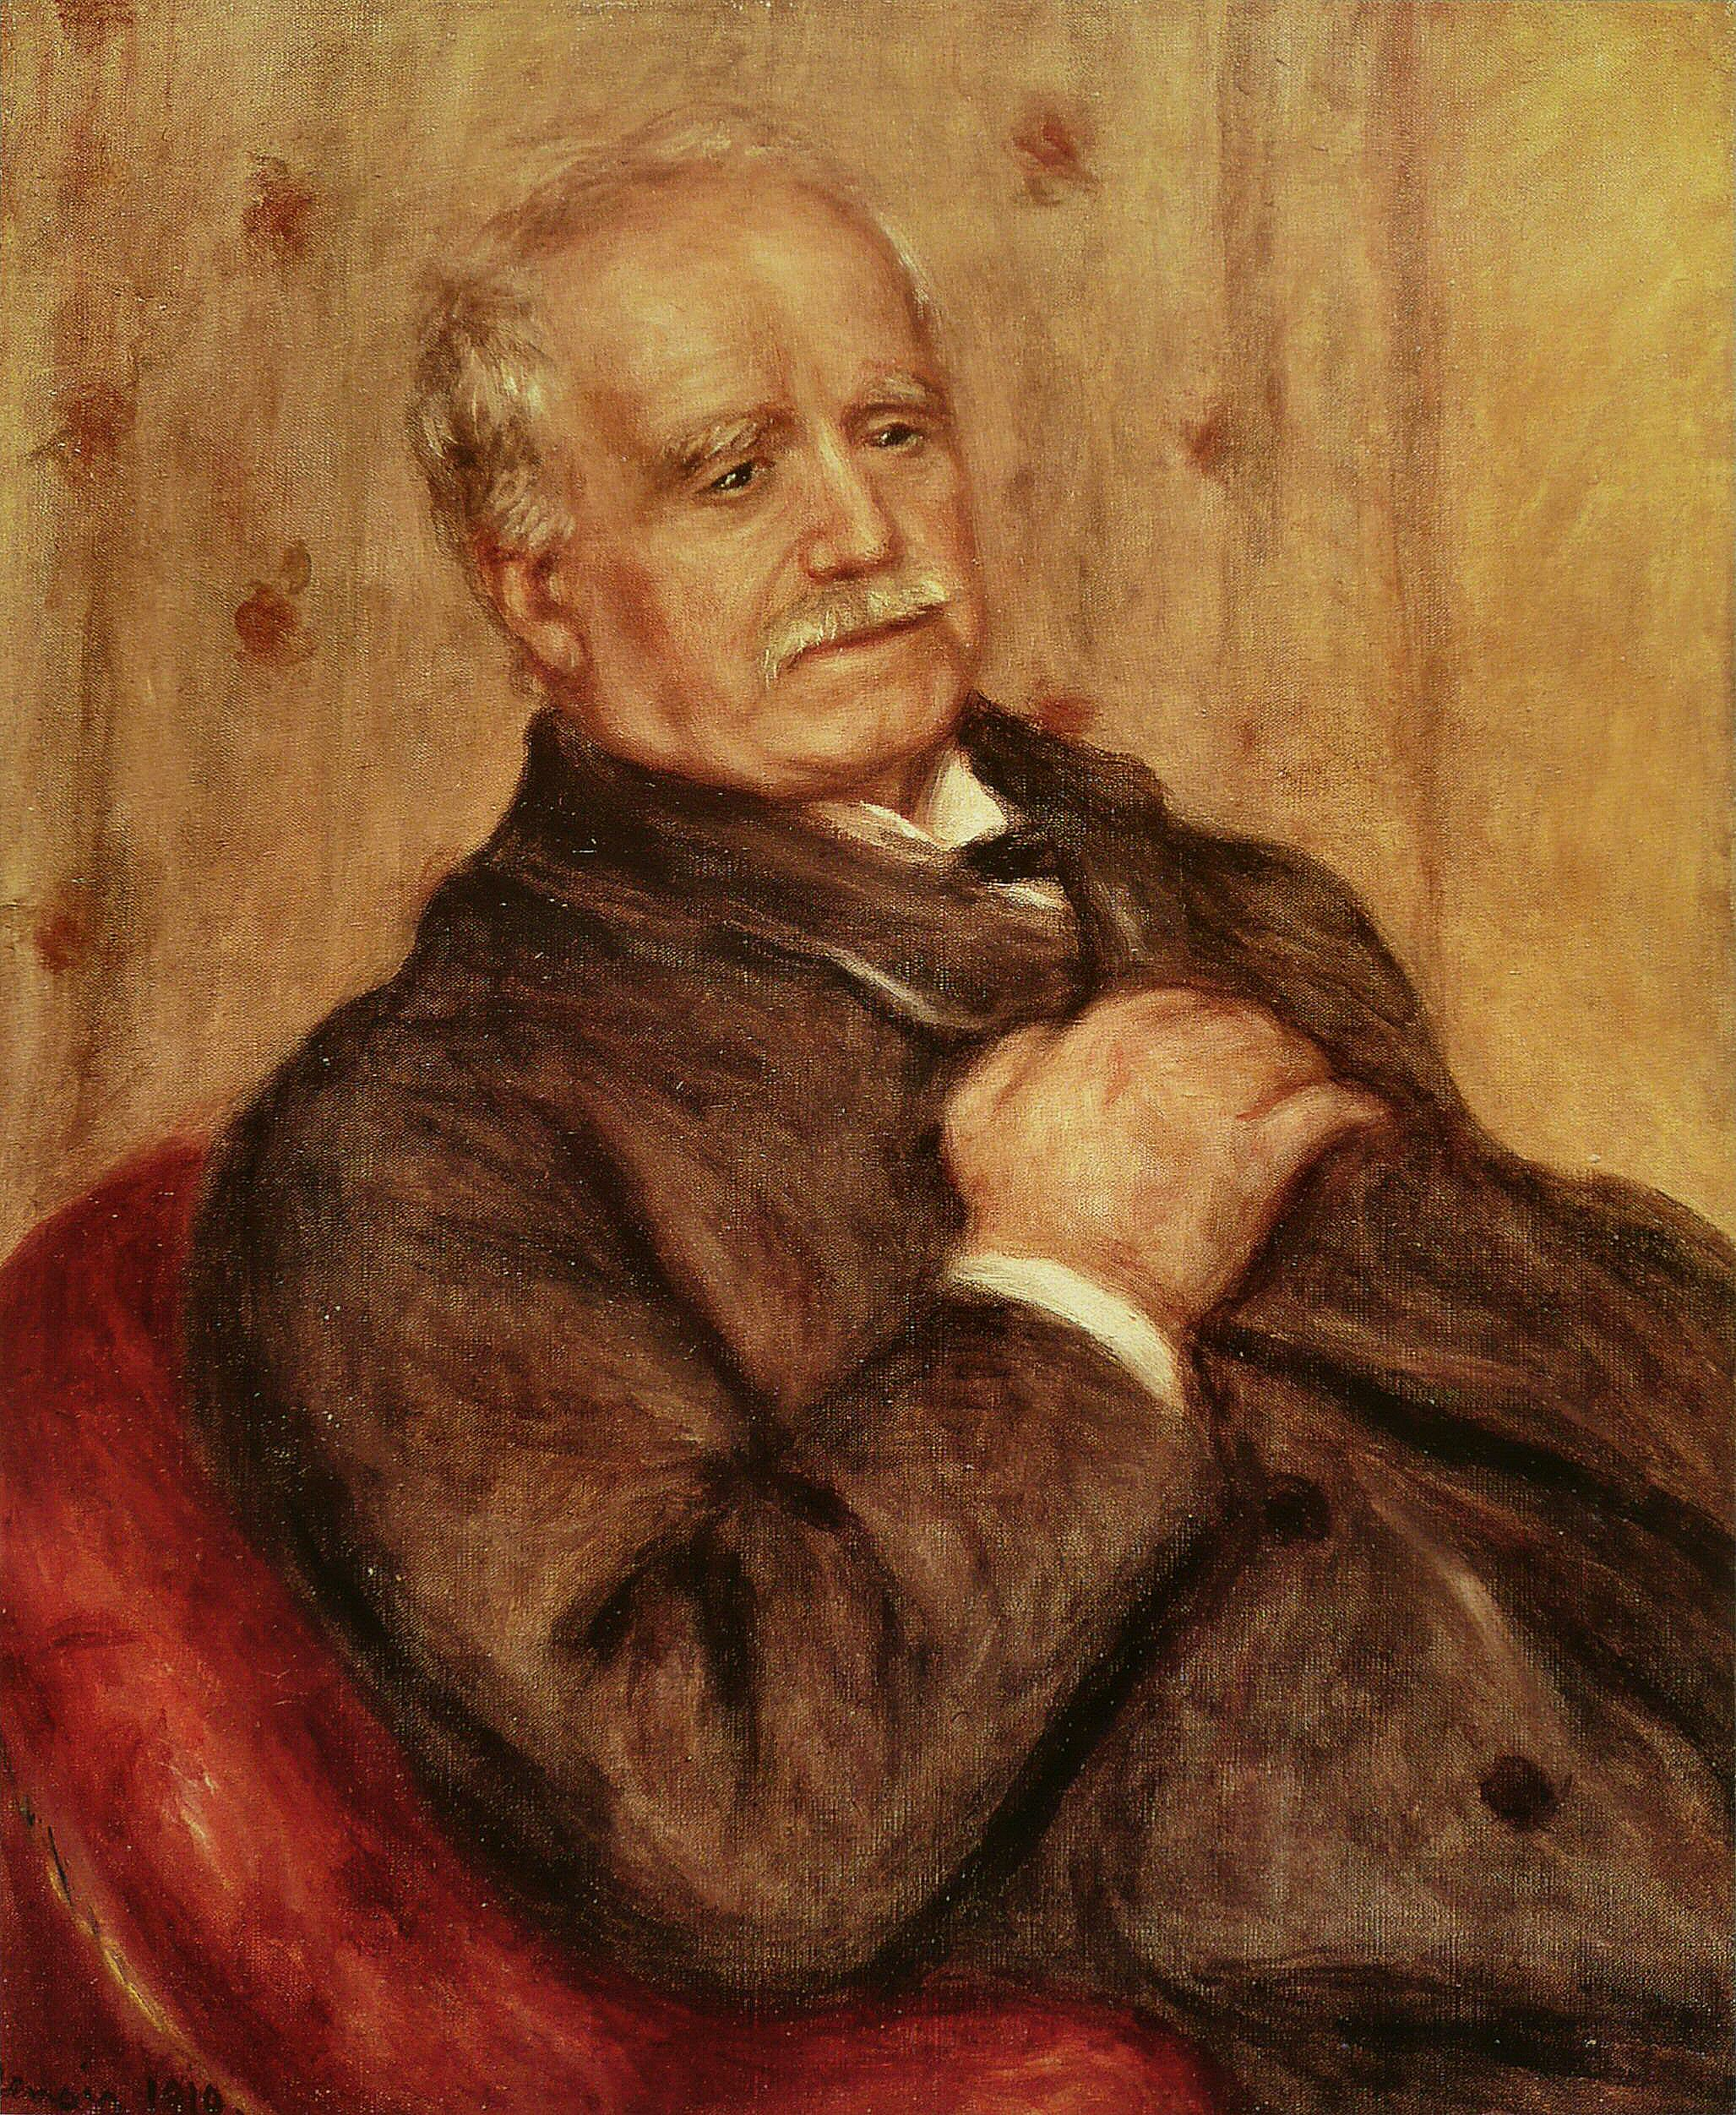 Portrait art dealer Durand-Ruel by Auguste Renoir